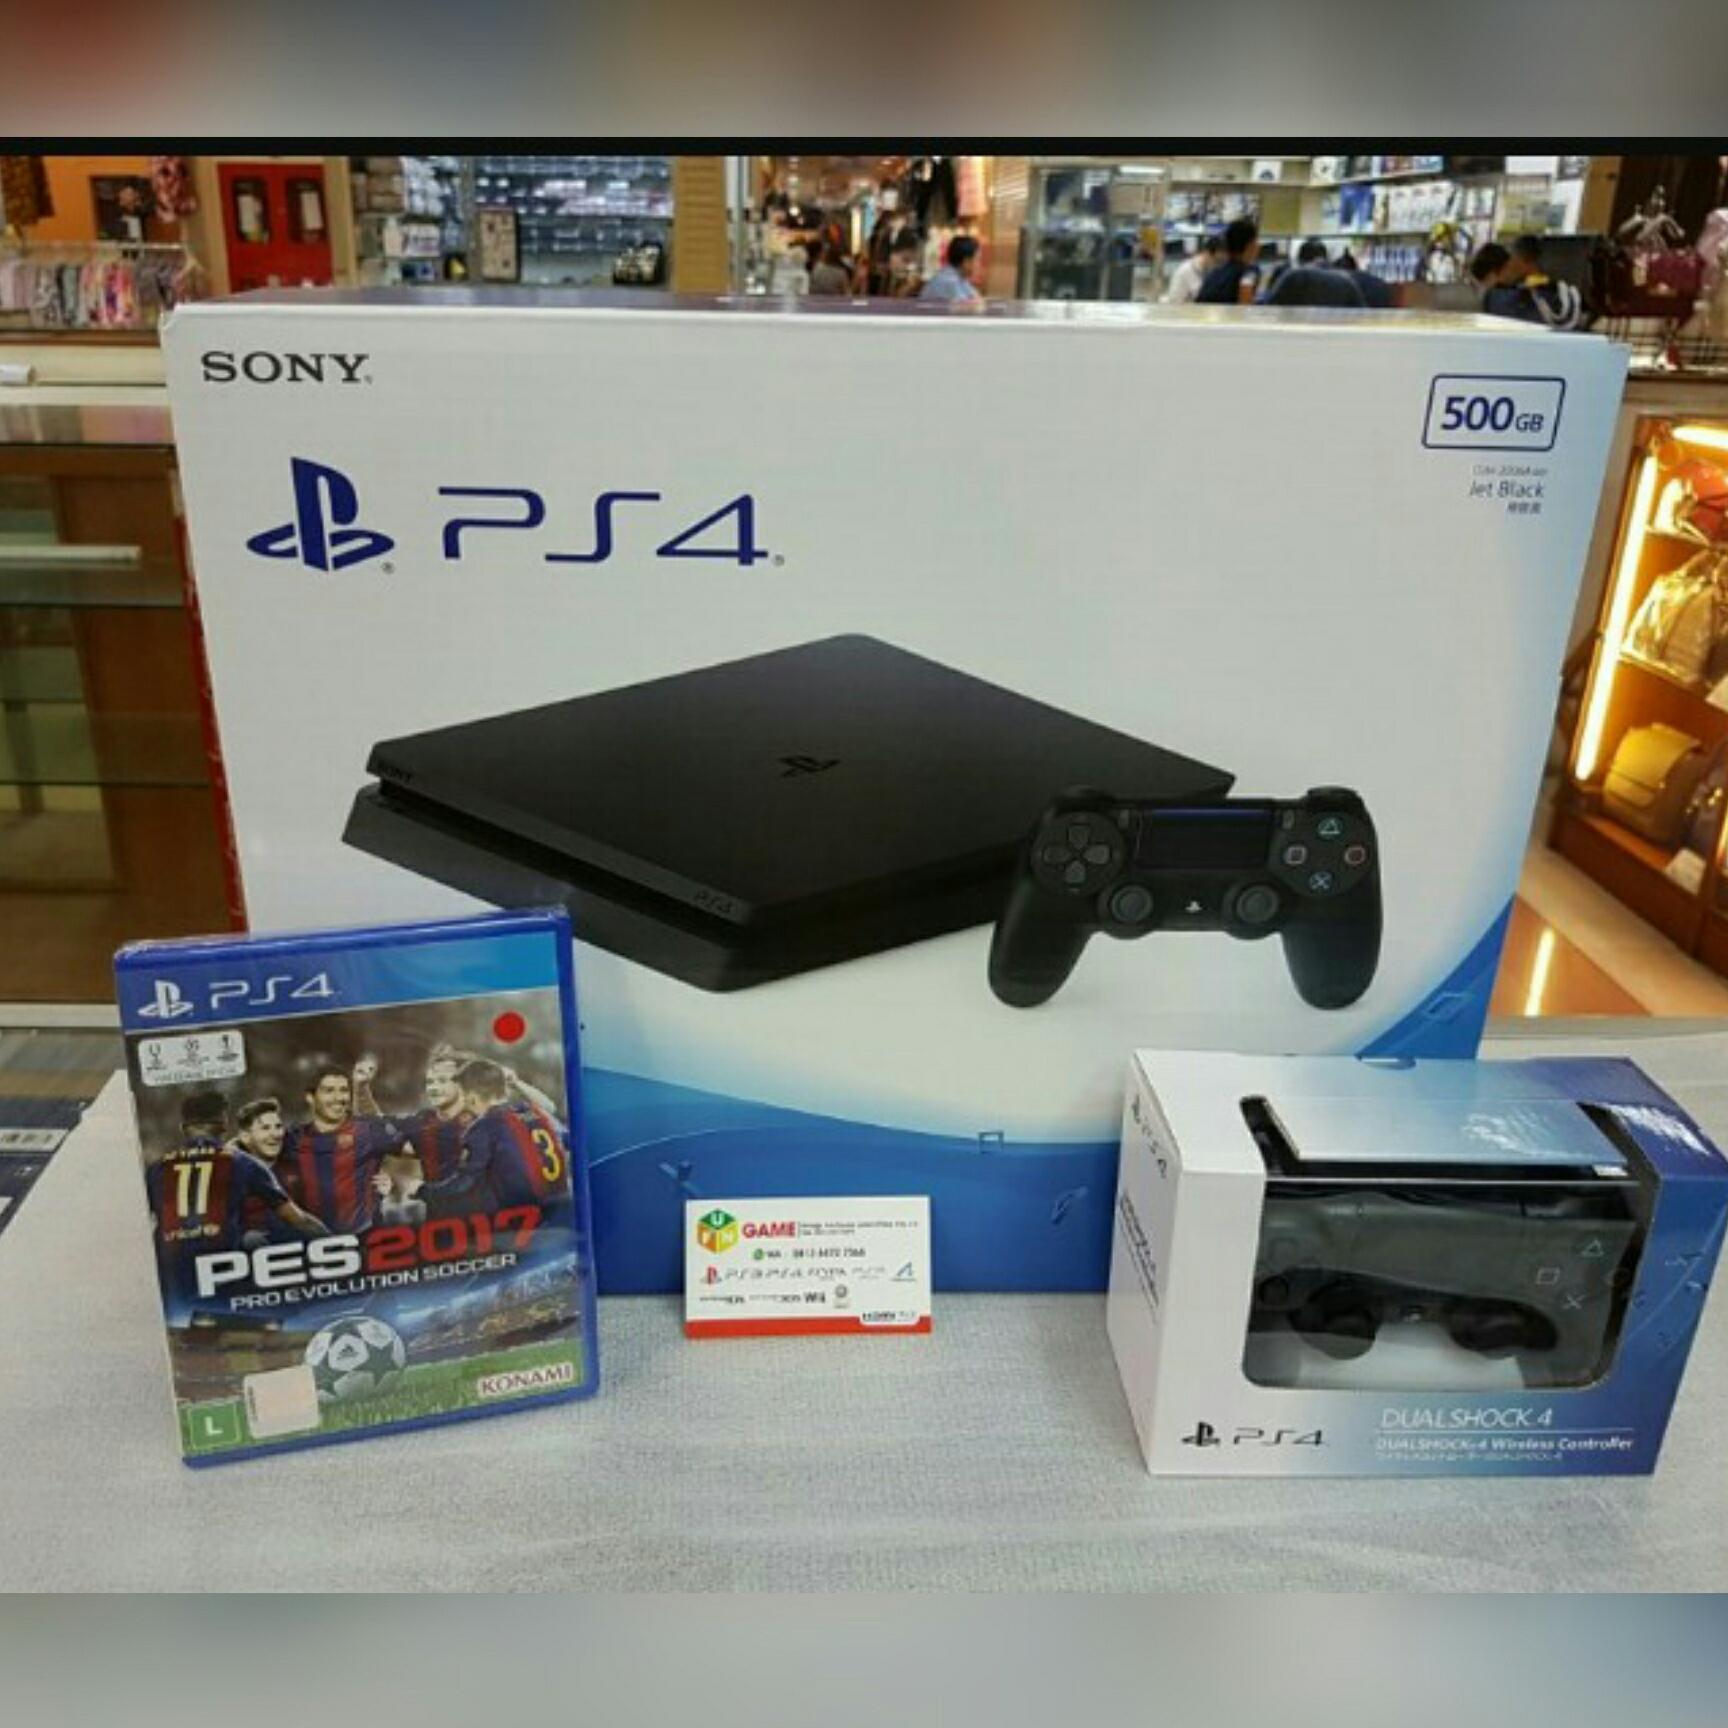 Kelebihan Ps3 Super Slim 500 Gb Terkini Daftar Harga Dan Tempat Sony Playstation 3 500gb Hitam Ps4 Asli Original